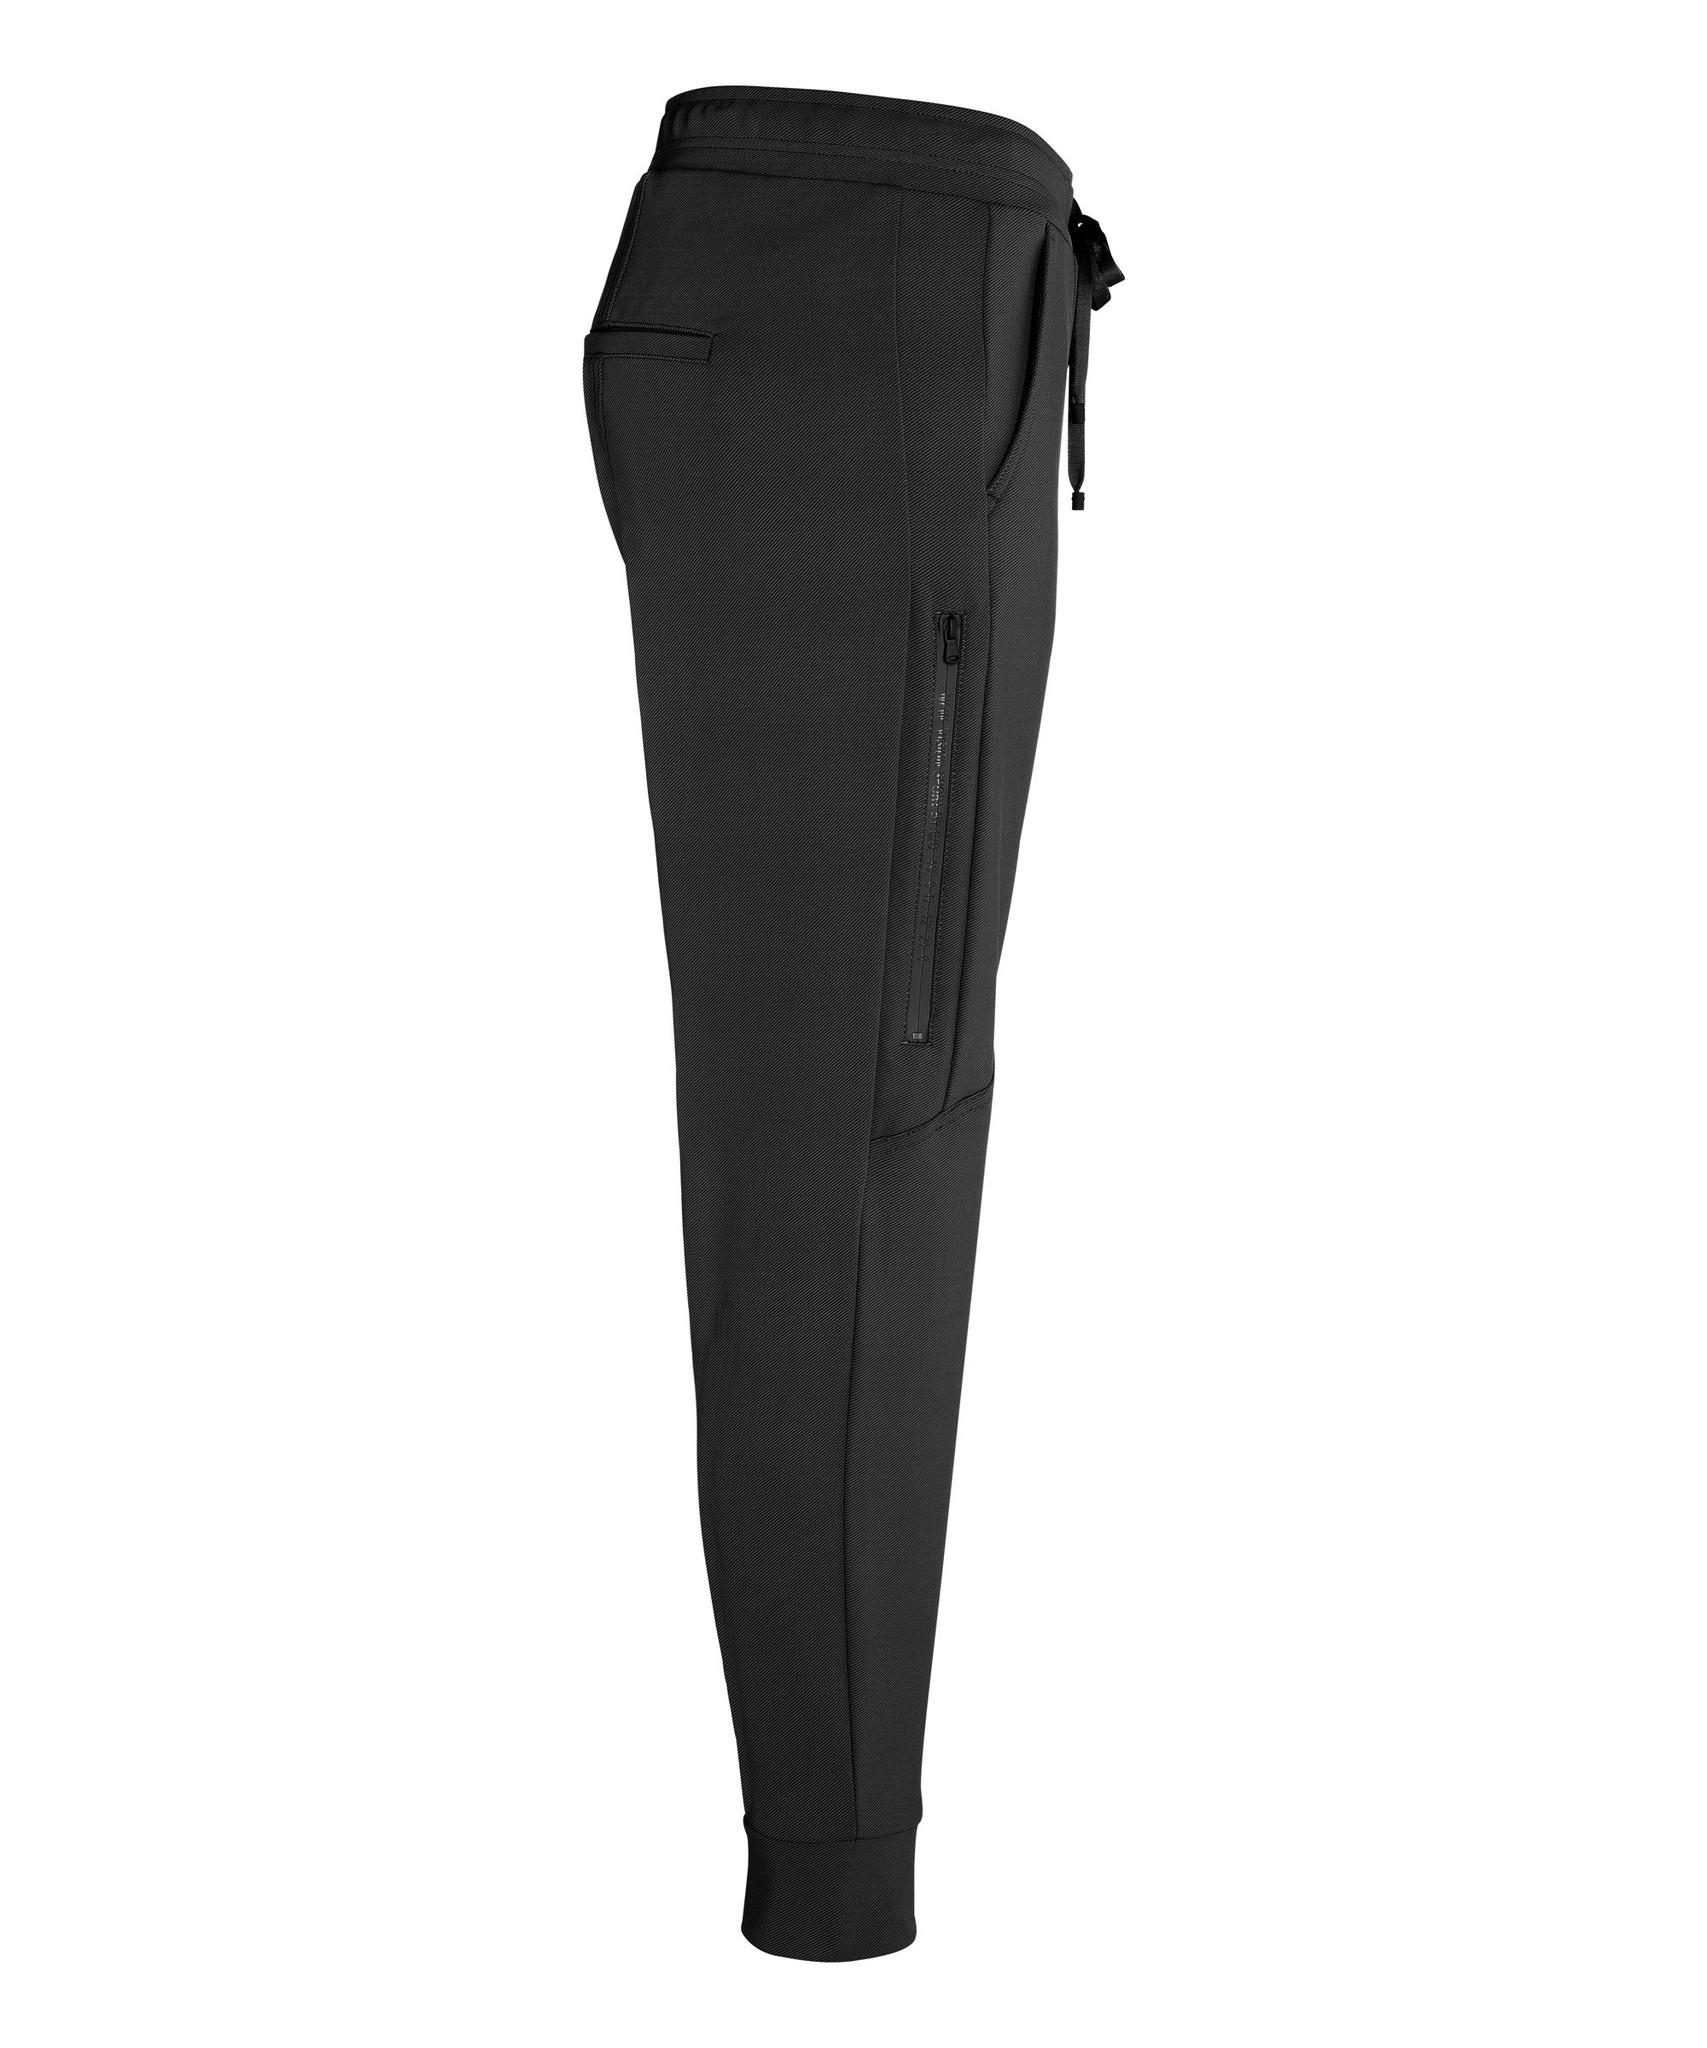 Cambio trousers JORDEN 6337-3